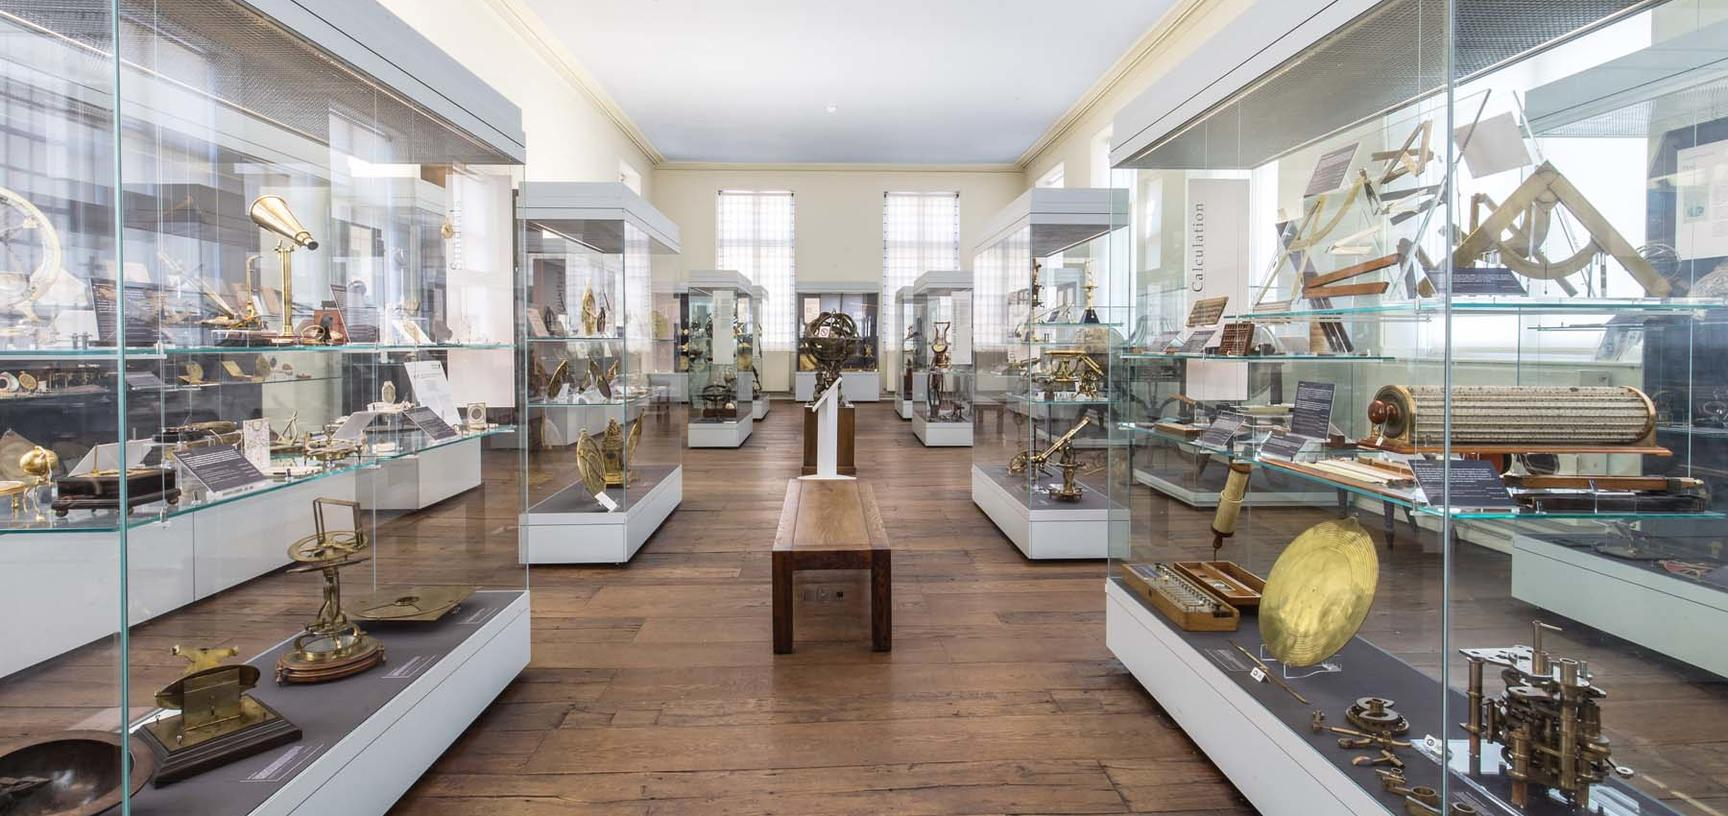 Upper gallery 237